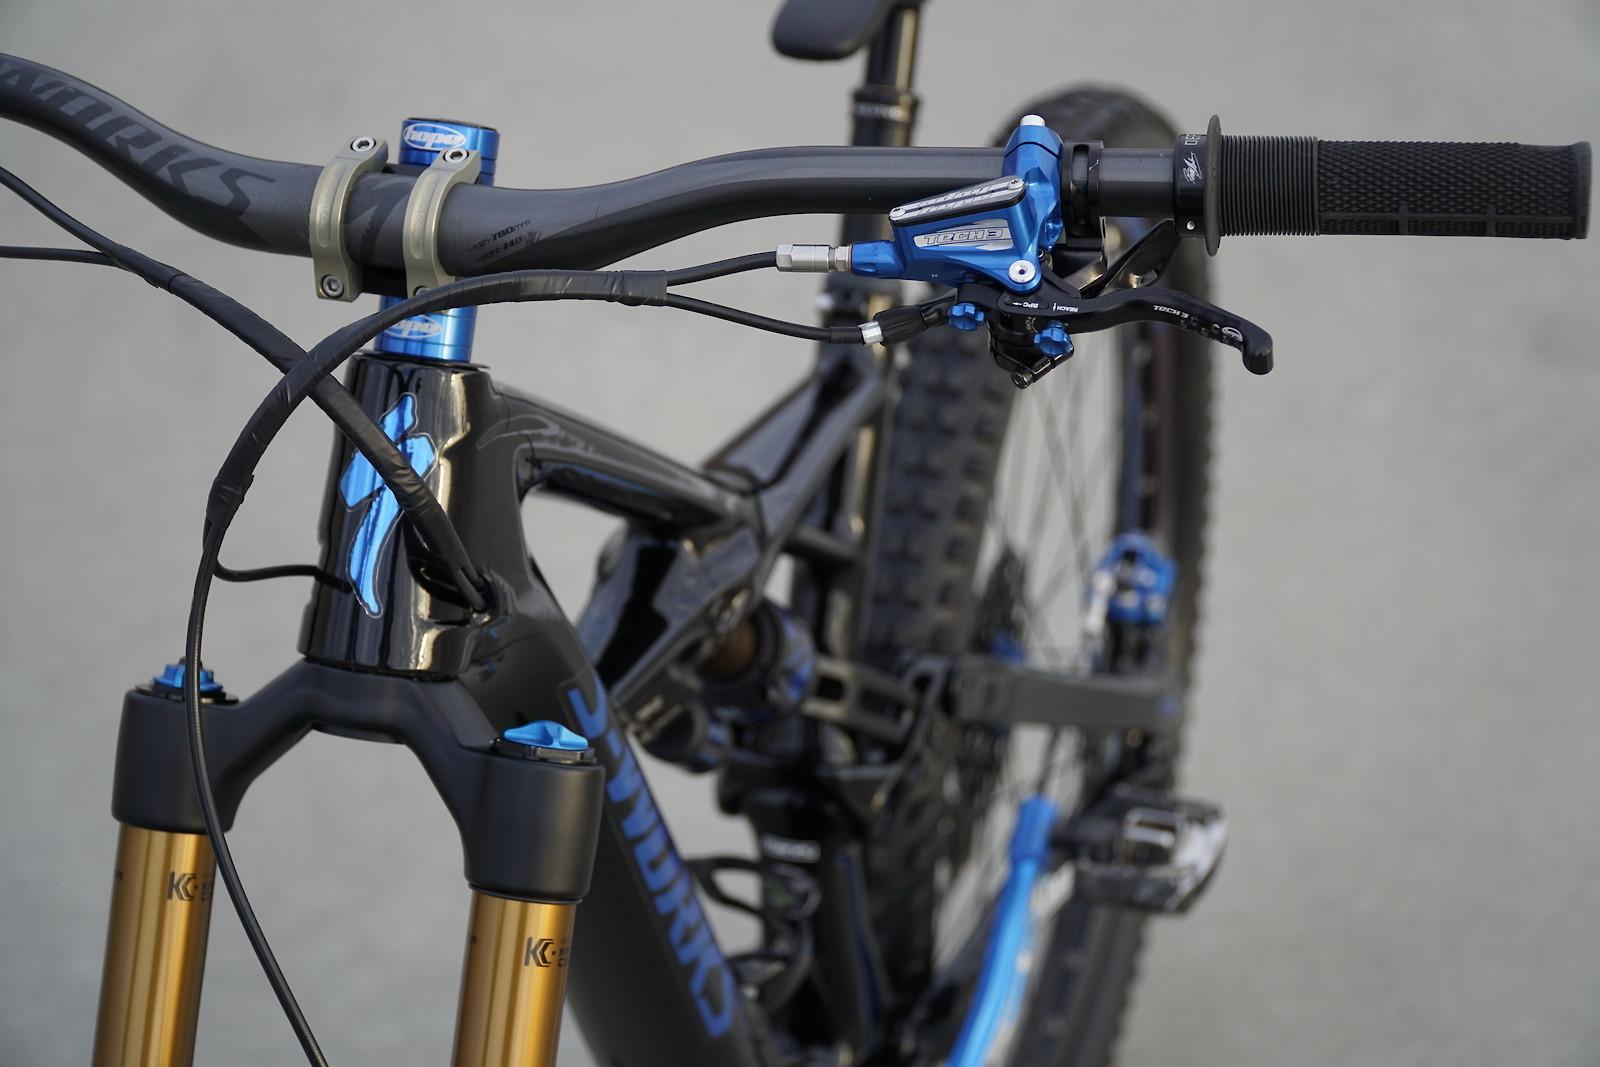 Why That Bike? | Specialized Enduro - Mountain Bikes Feature Stories